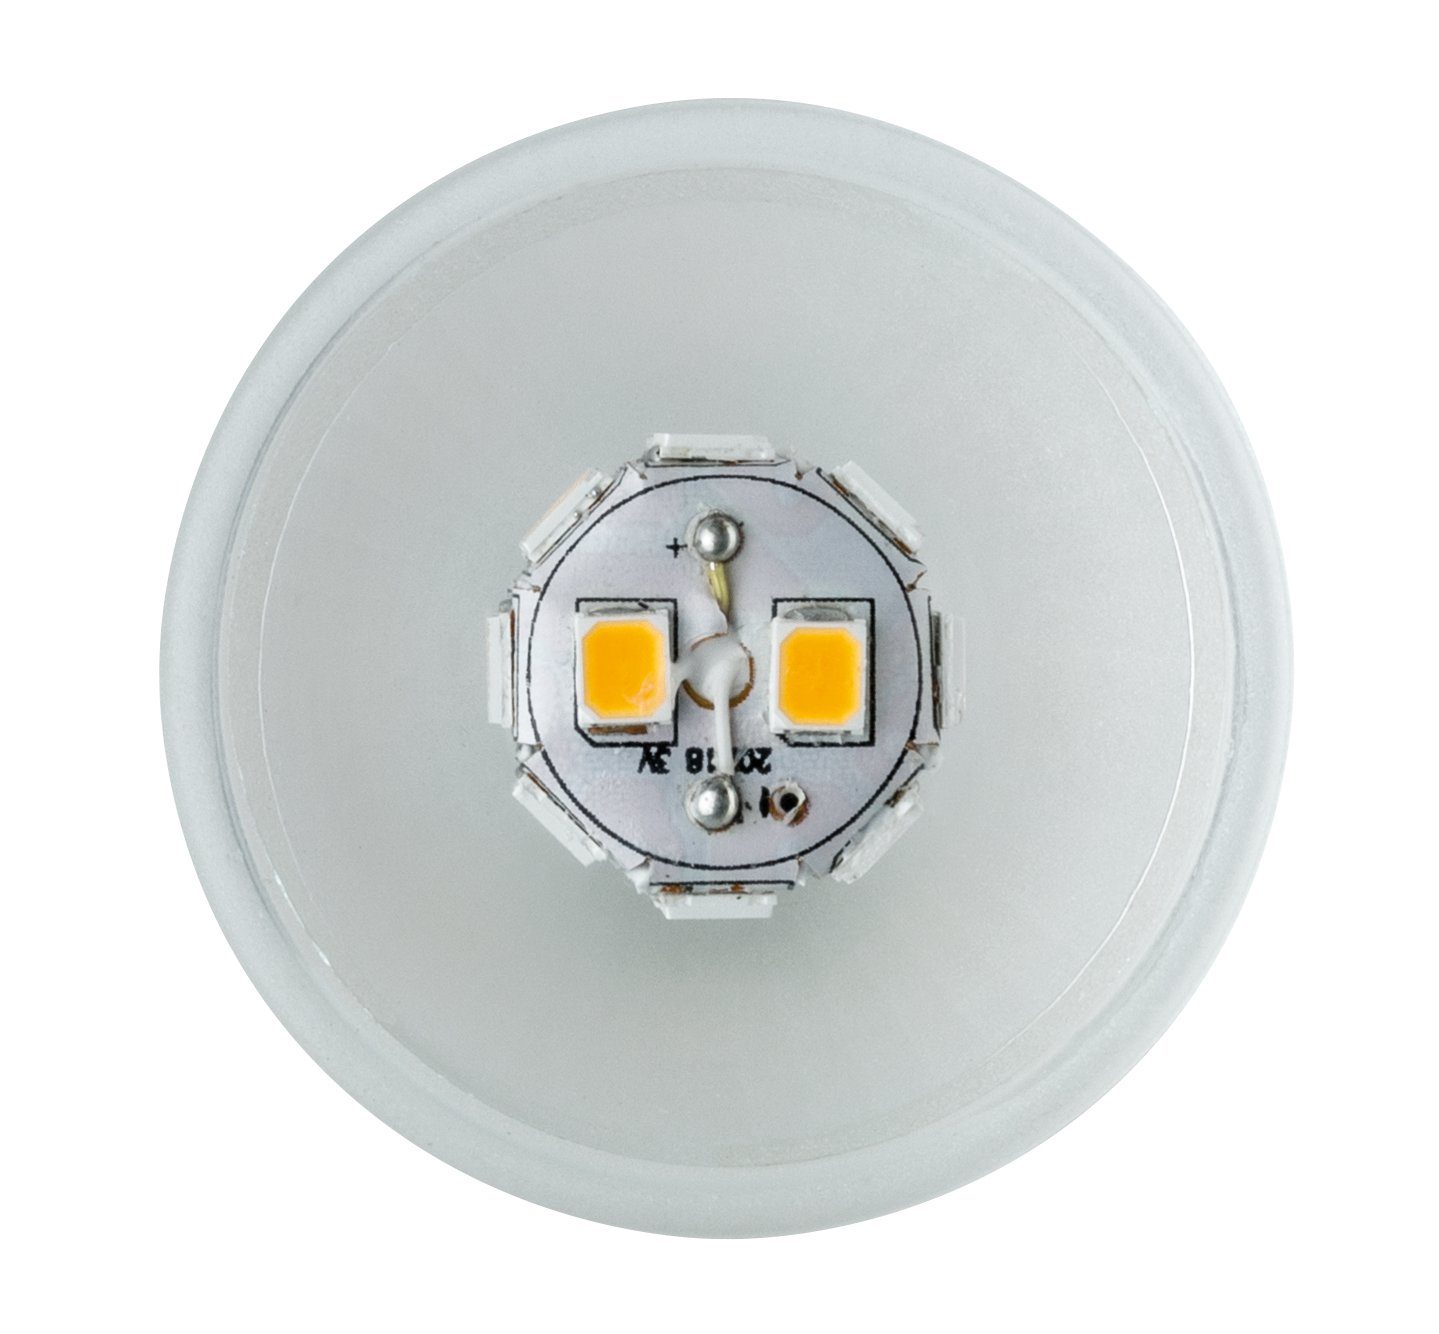 Réflecteur LED Maxiflood 1,8W GU4 12V